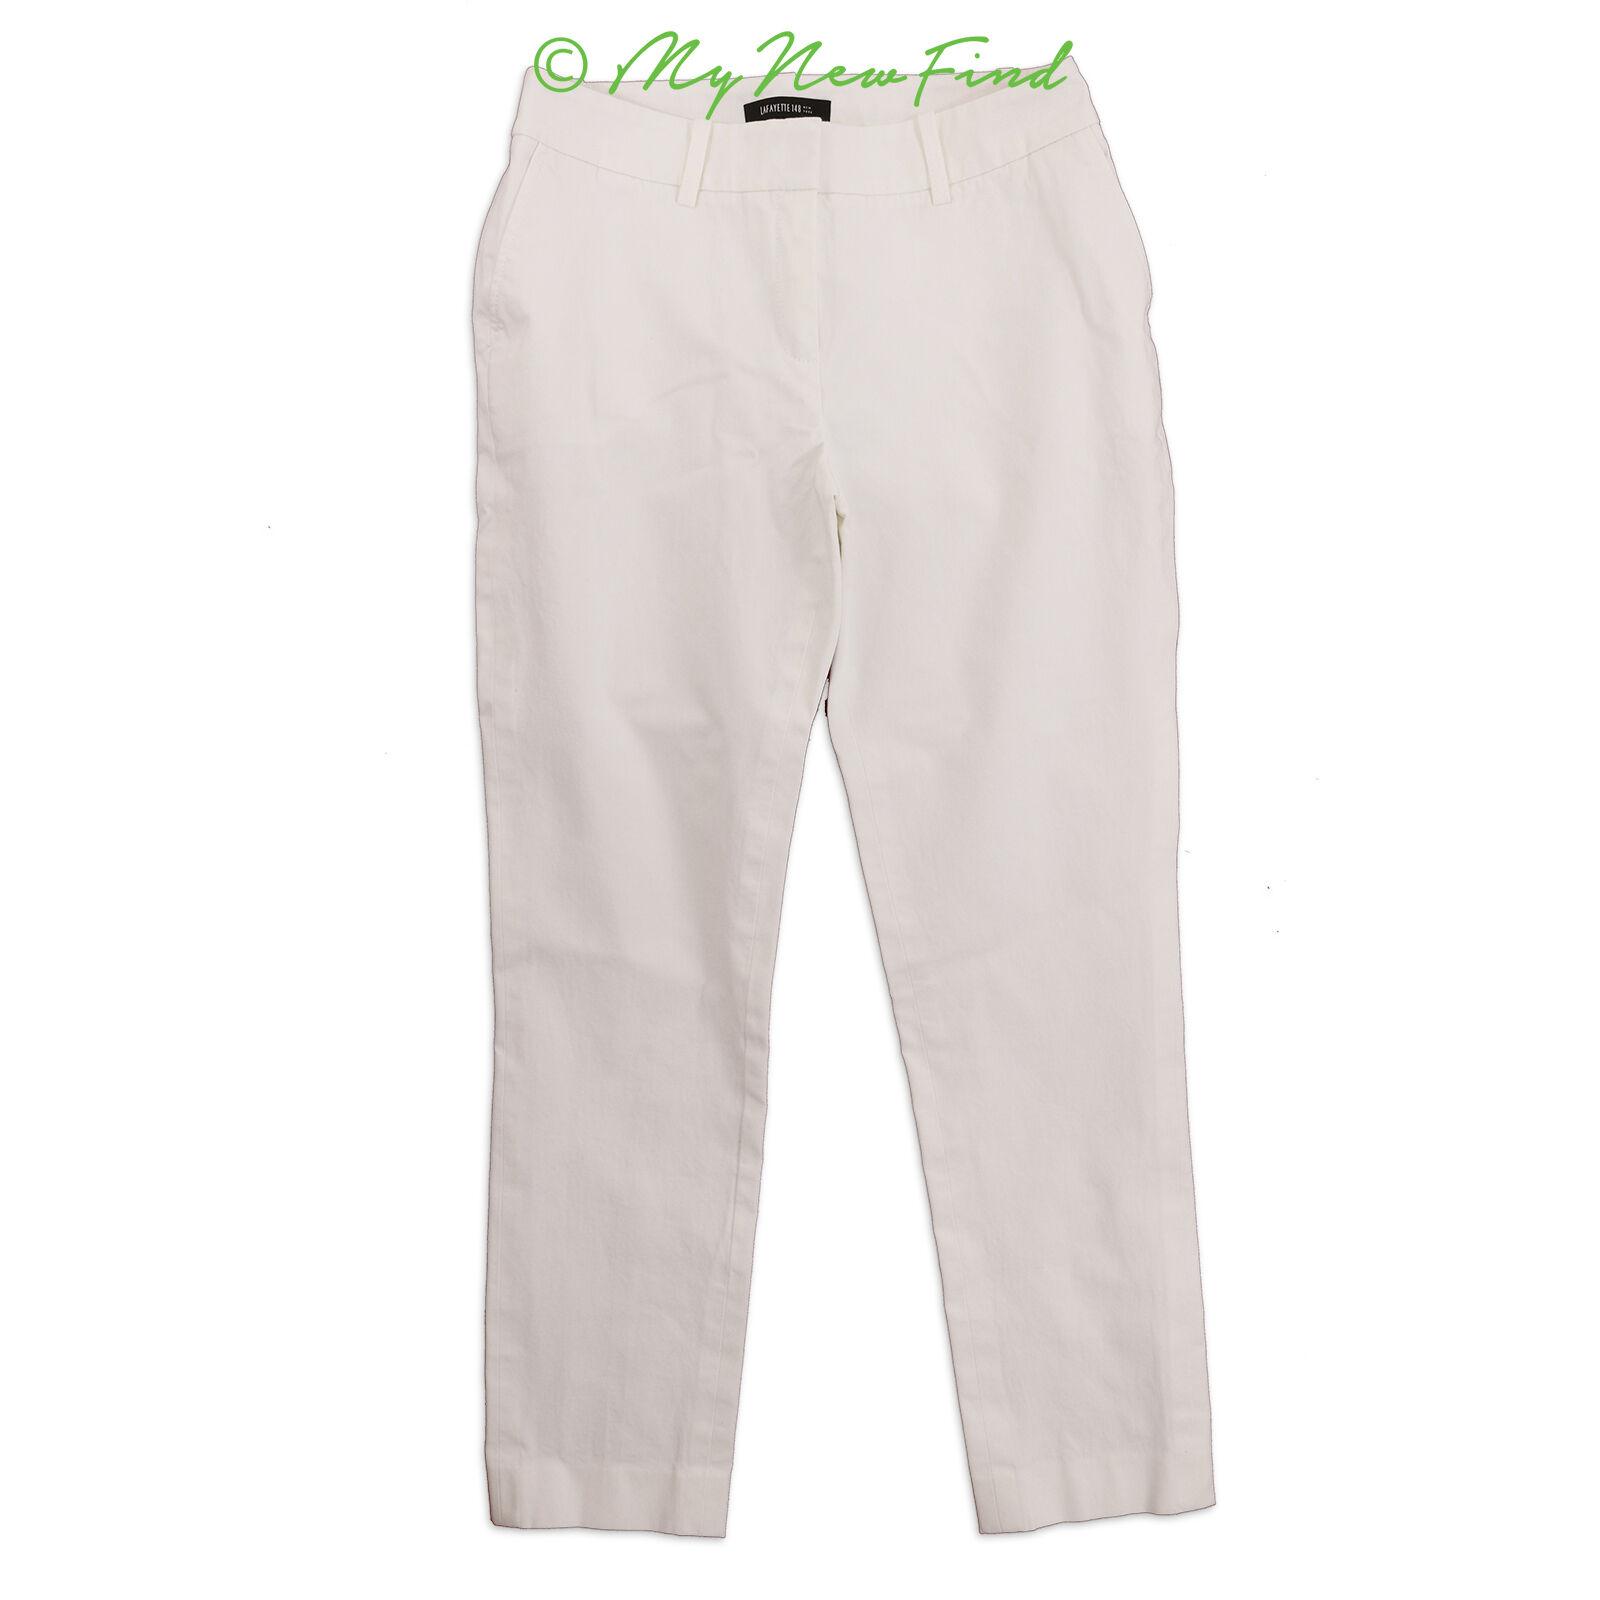 Lafayette 148 Dress Pants Size 4 Skinny Ankle Zip Cotton Stretch White EUC  B81